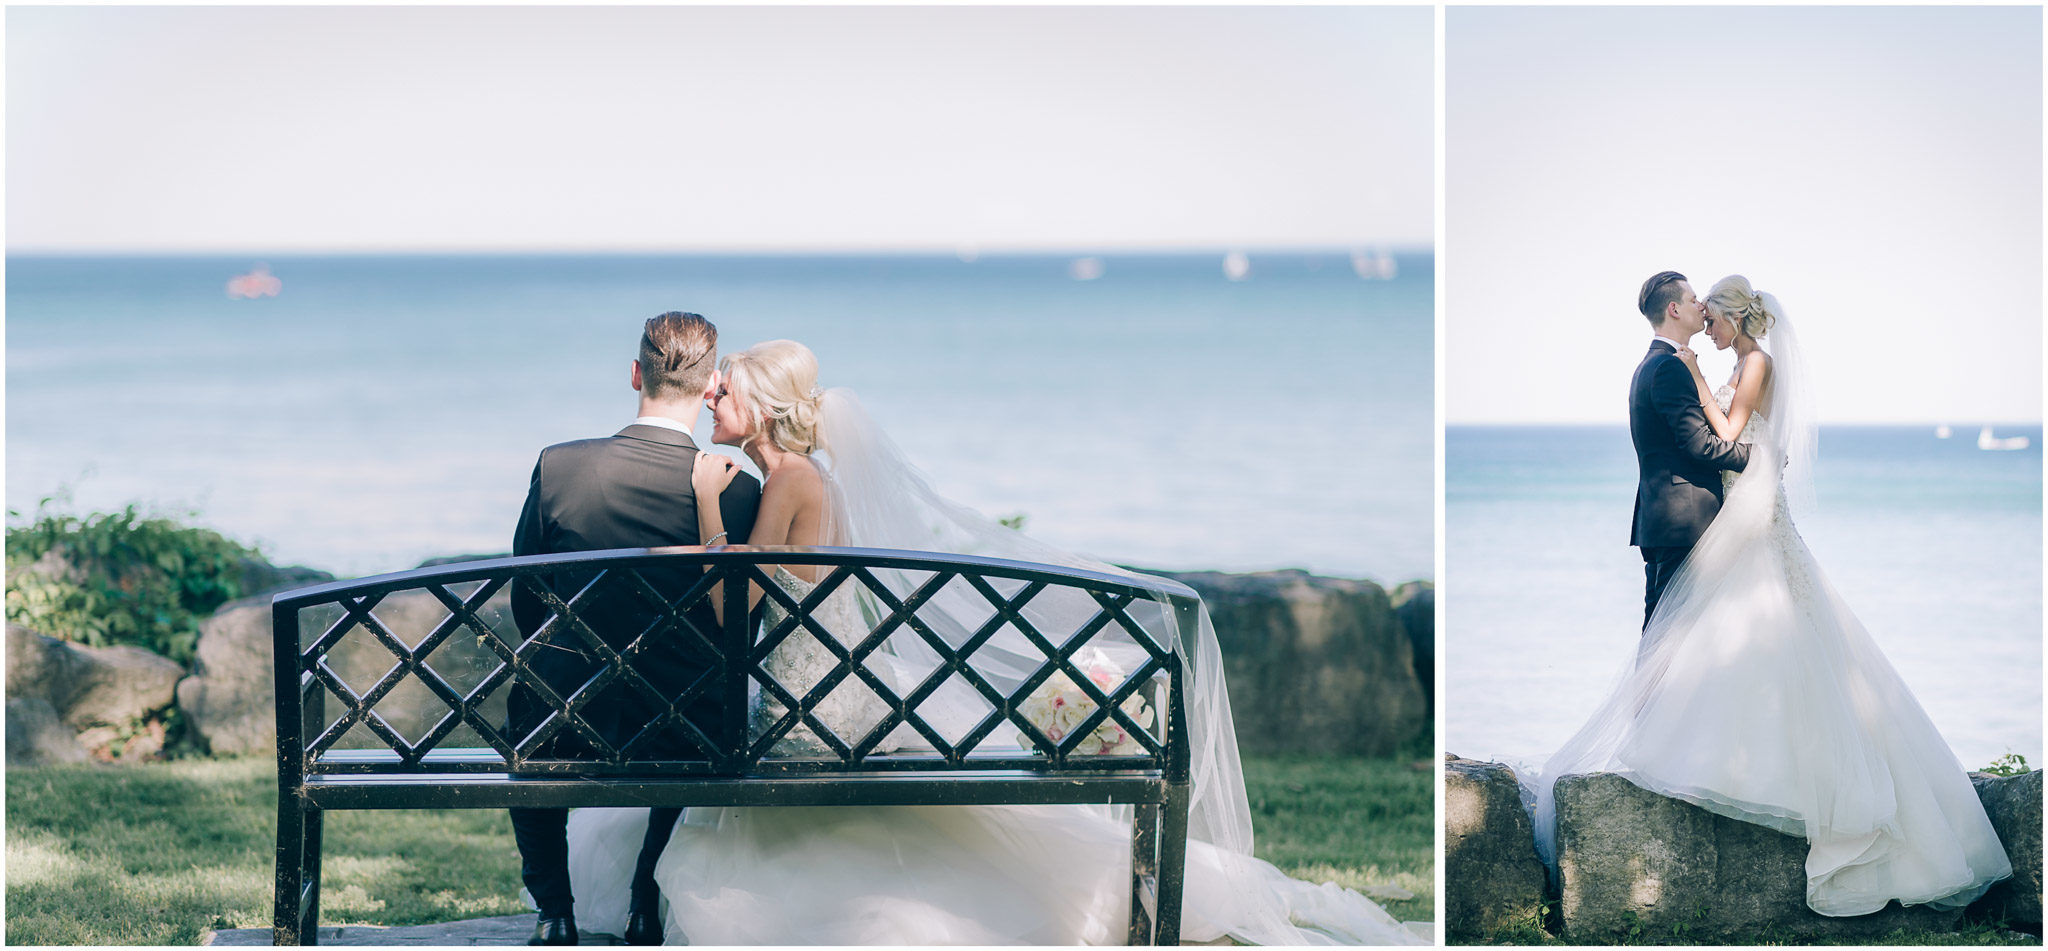 wedding-adamson-estate-universal-event-space-creative-portrait-1